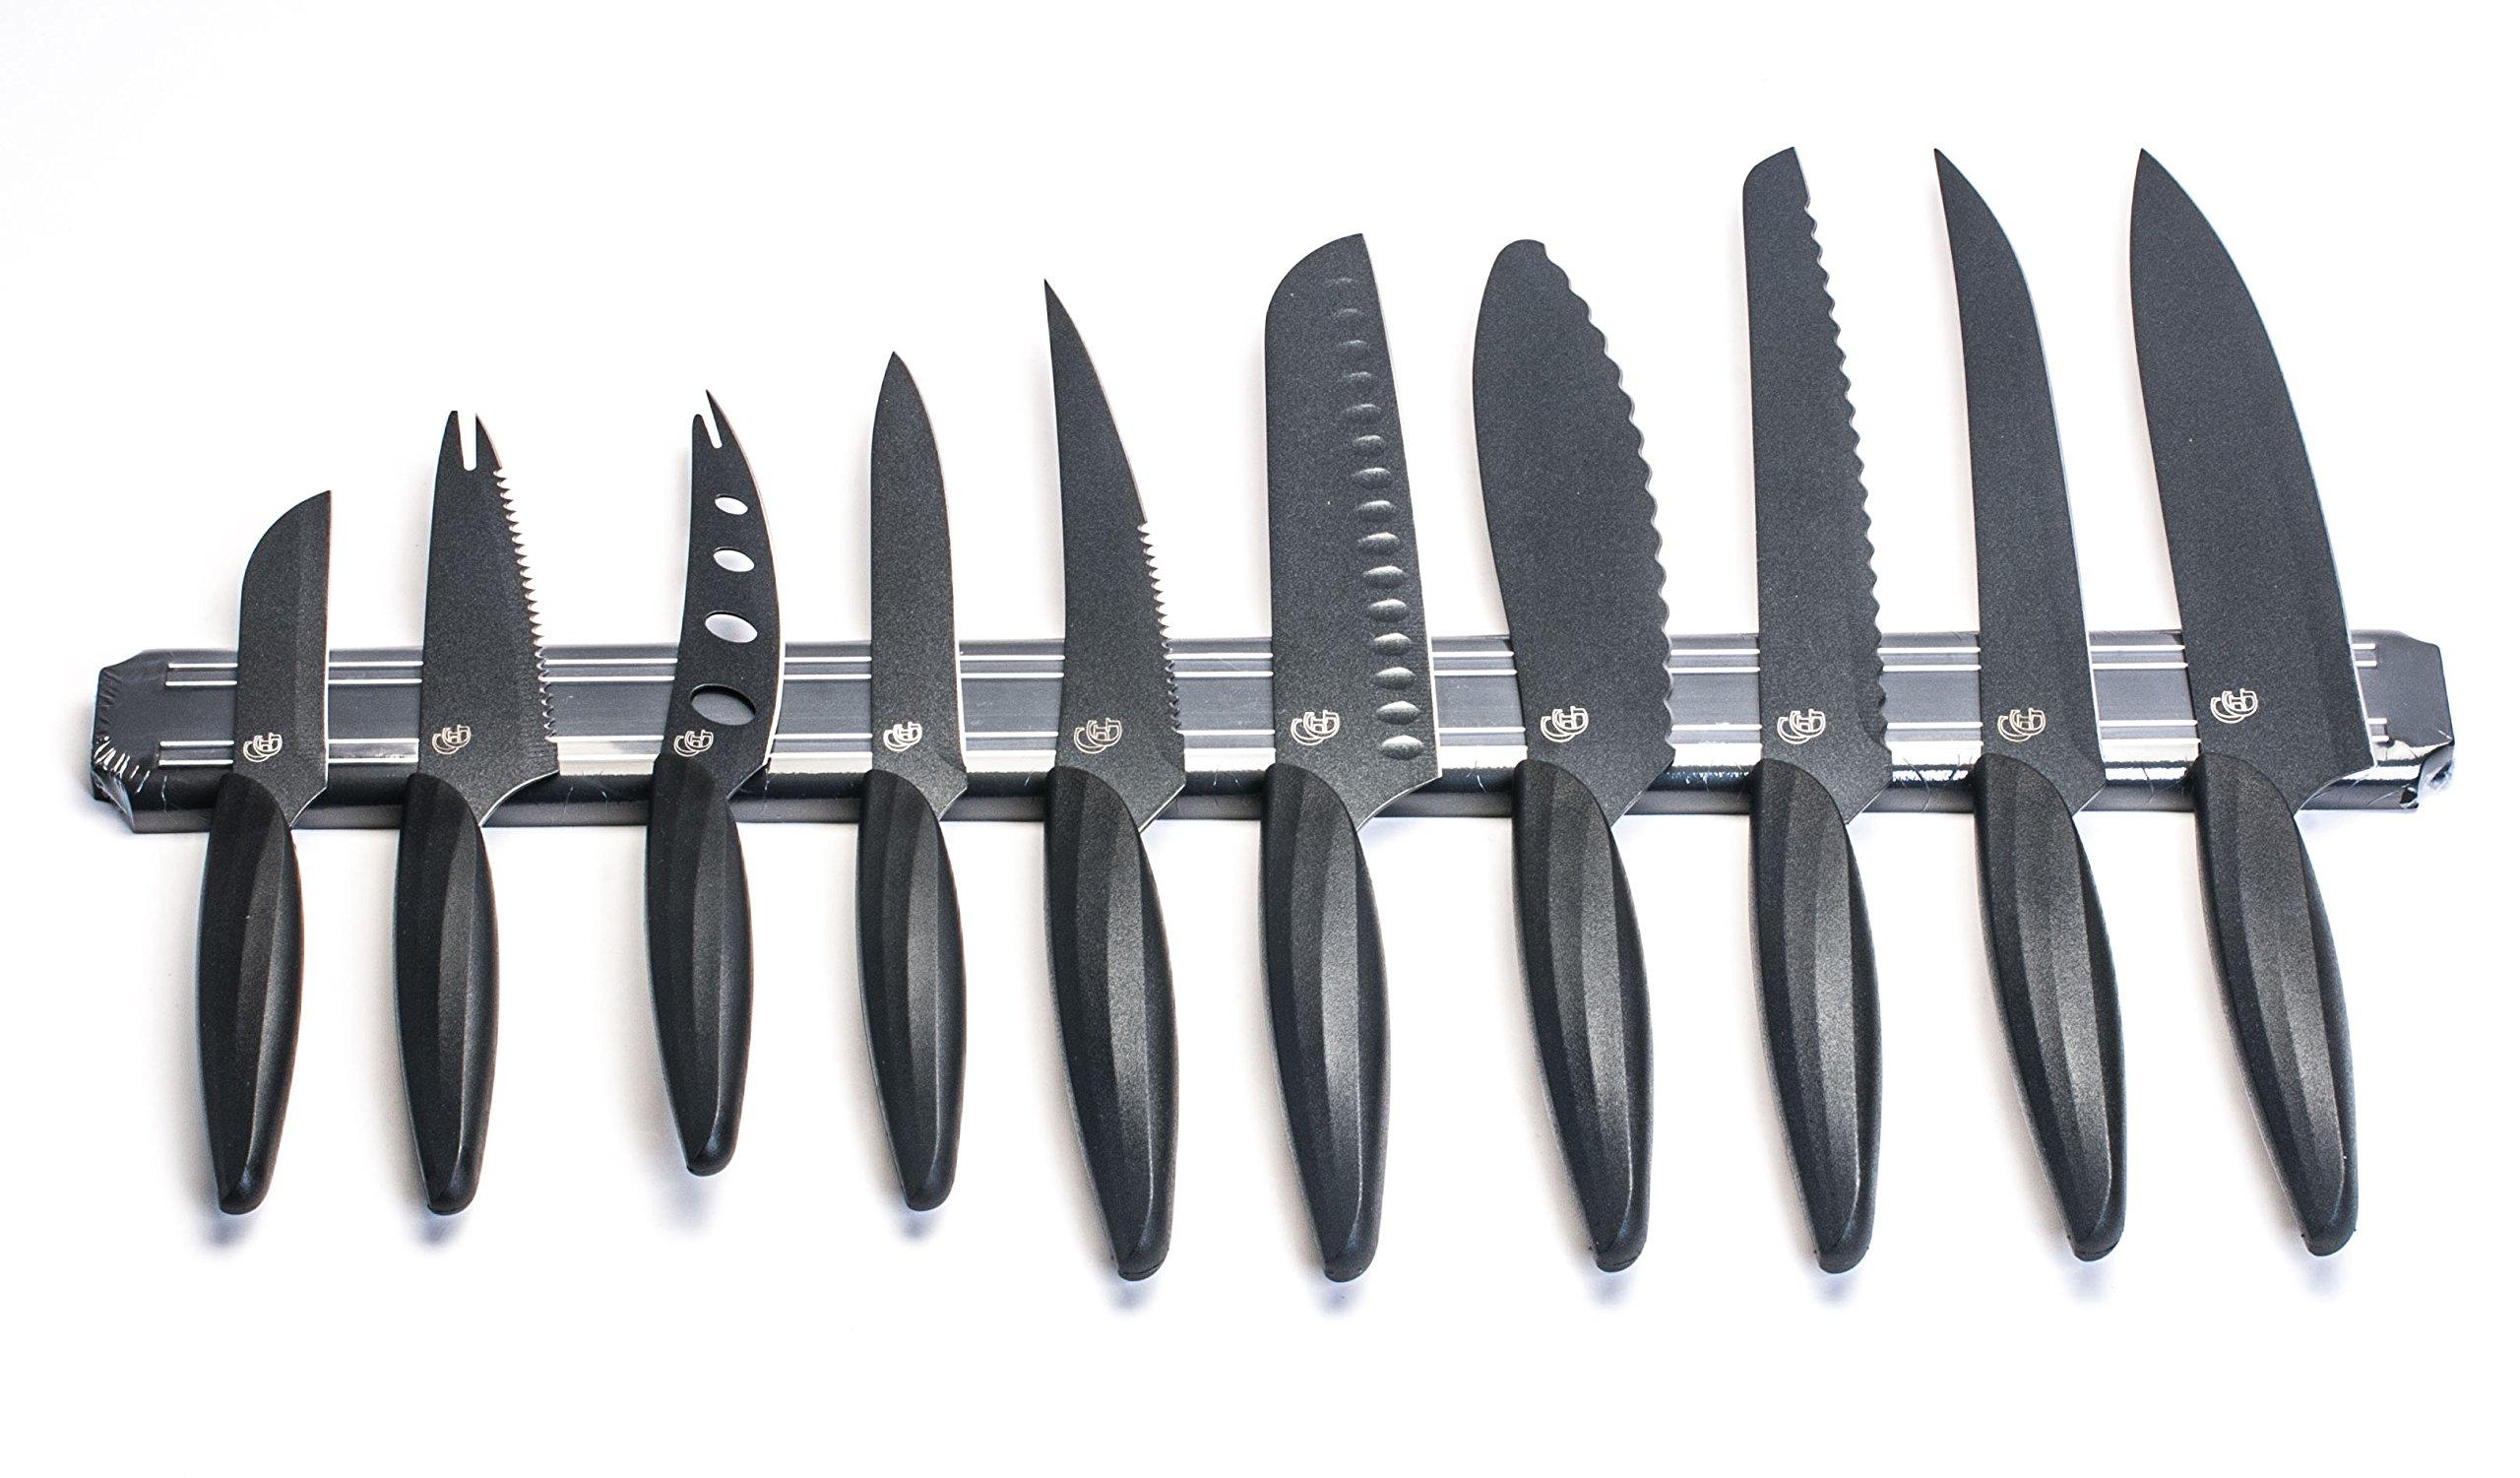 GELA EK-0848 10 Piece Knife Set With Magnetic Bar, 3'', Black by Gela